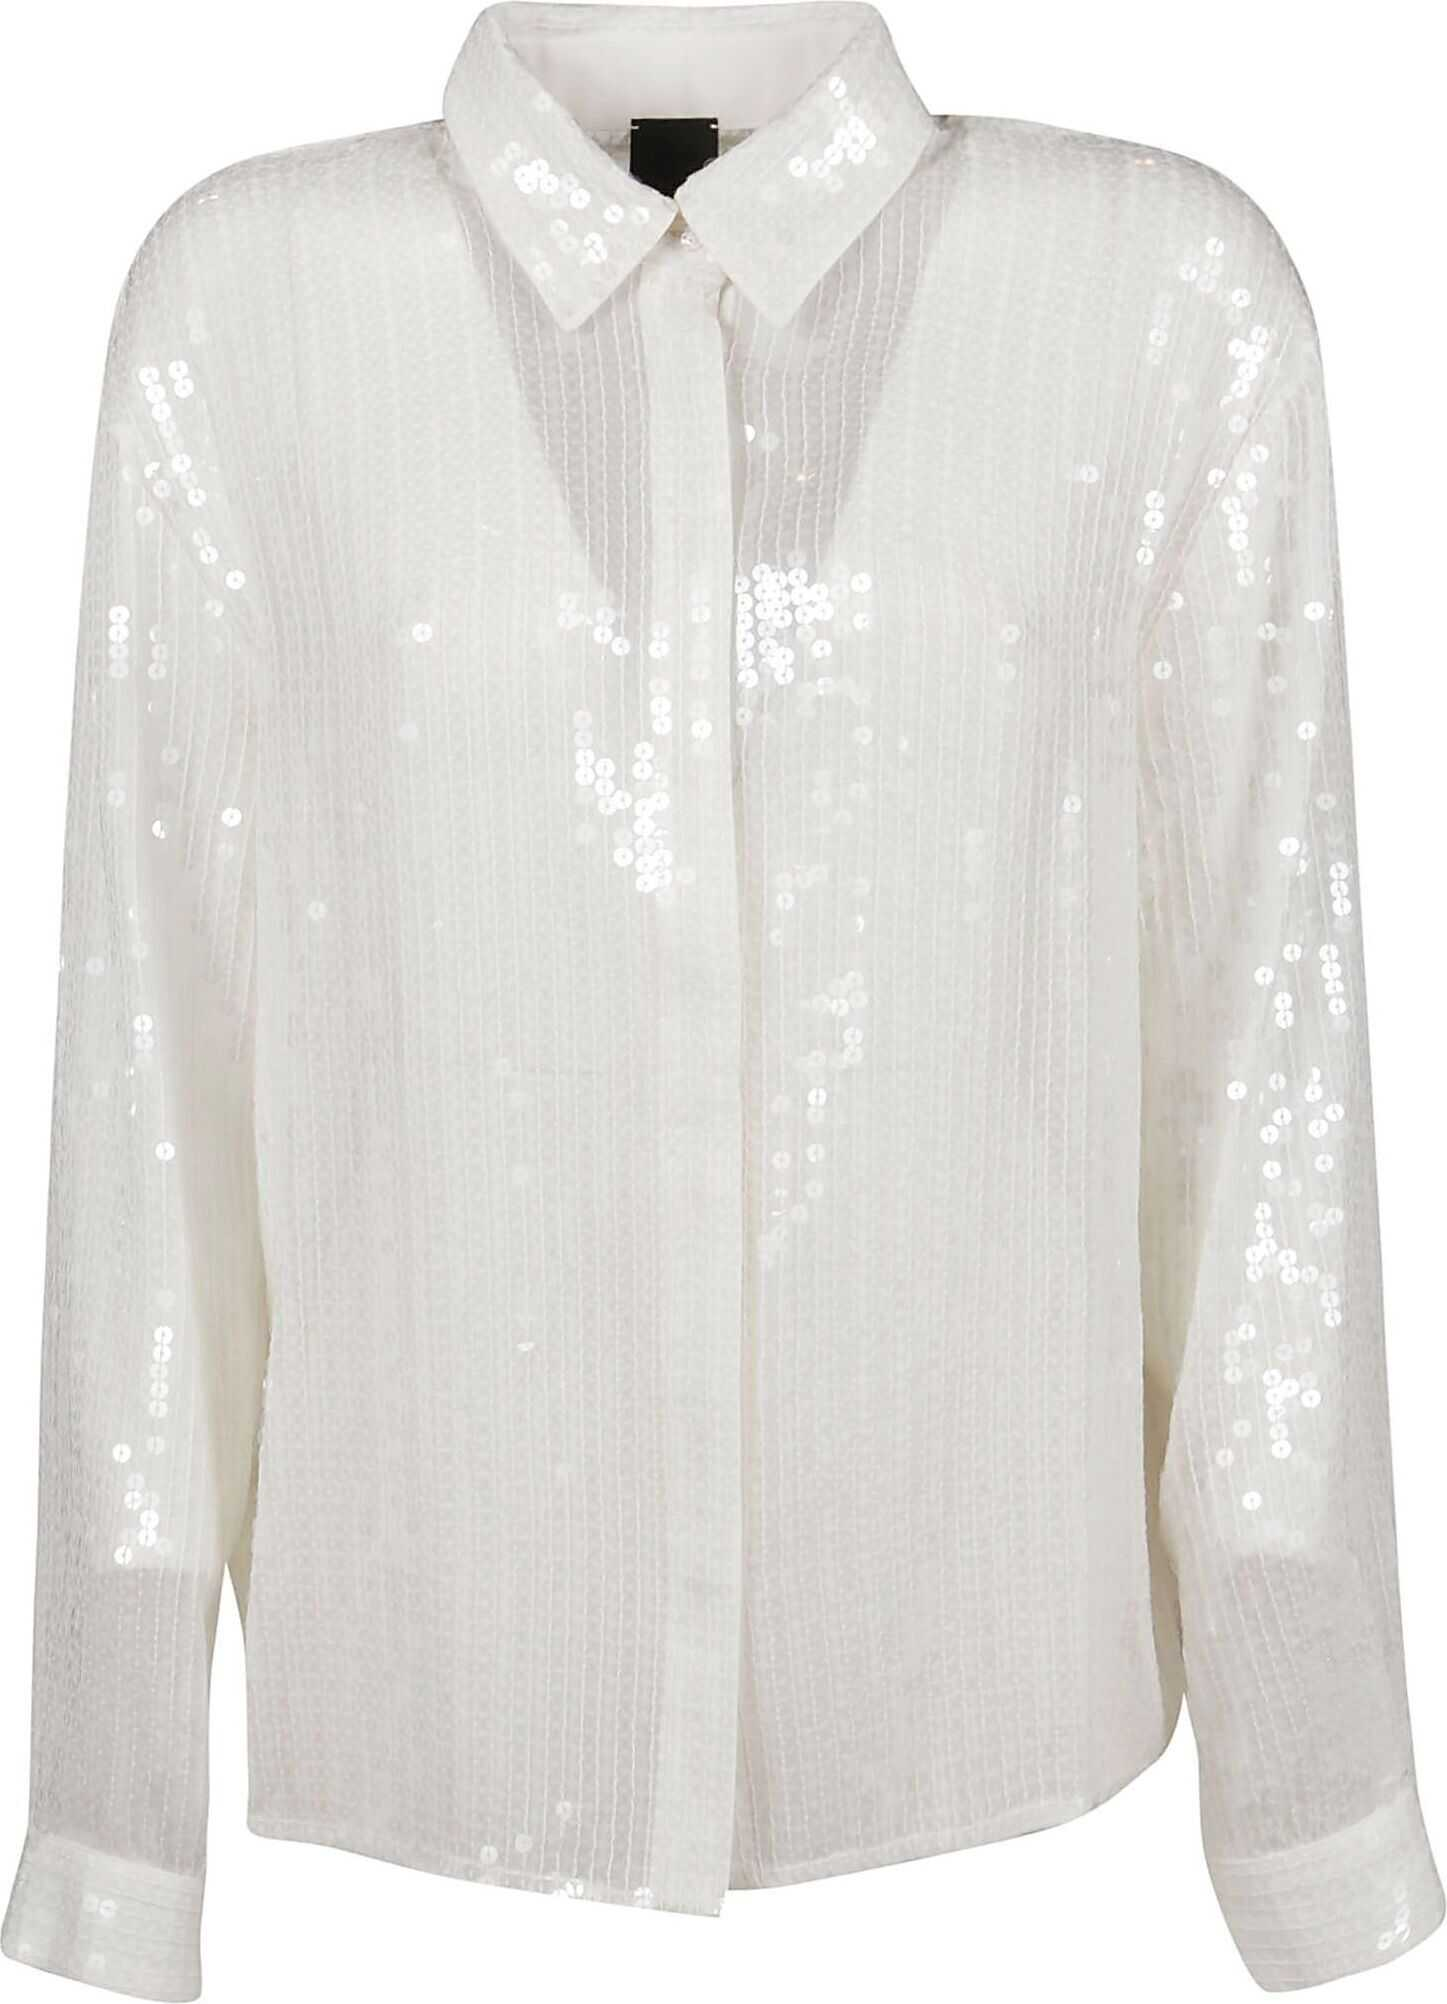 Polyester Shirt thumbnail